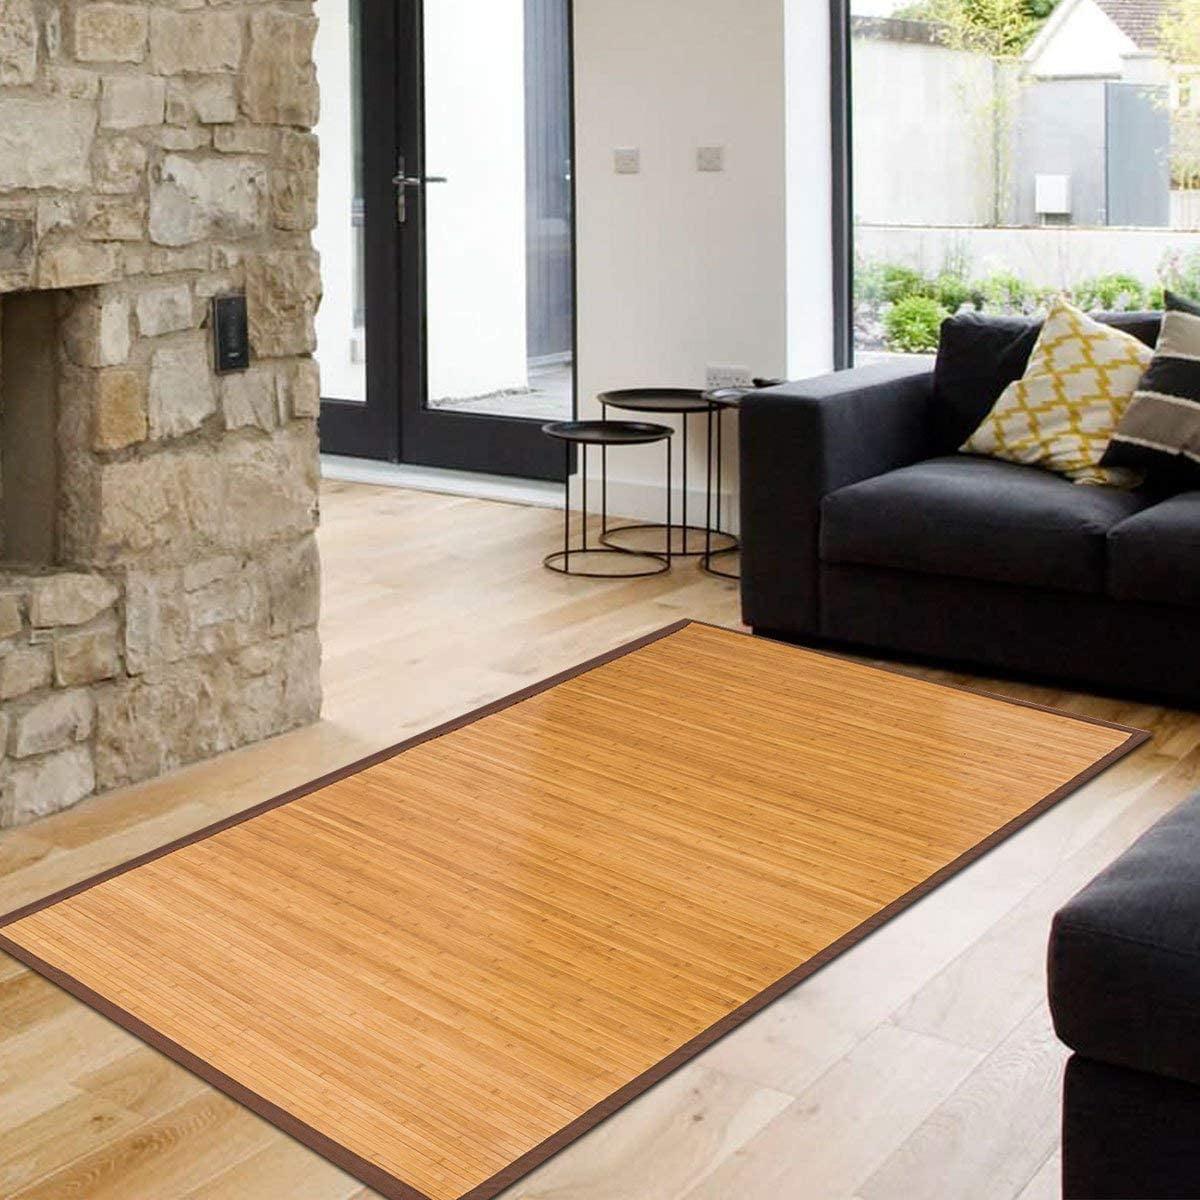 Topcobe 5 X 8 Bamboo Floor Mat Foldable Bamboo Rug Area Rug Floor Carpet For Indoor Outdoor Bathroom Kitchen And Bedroom Walmart Com Walmart Com